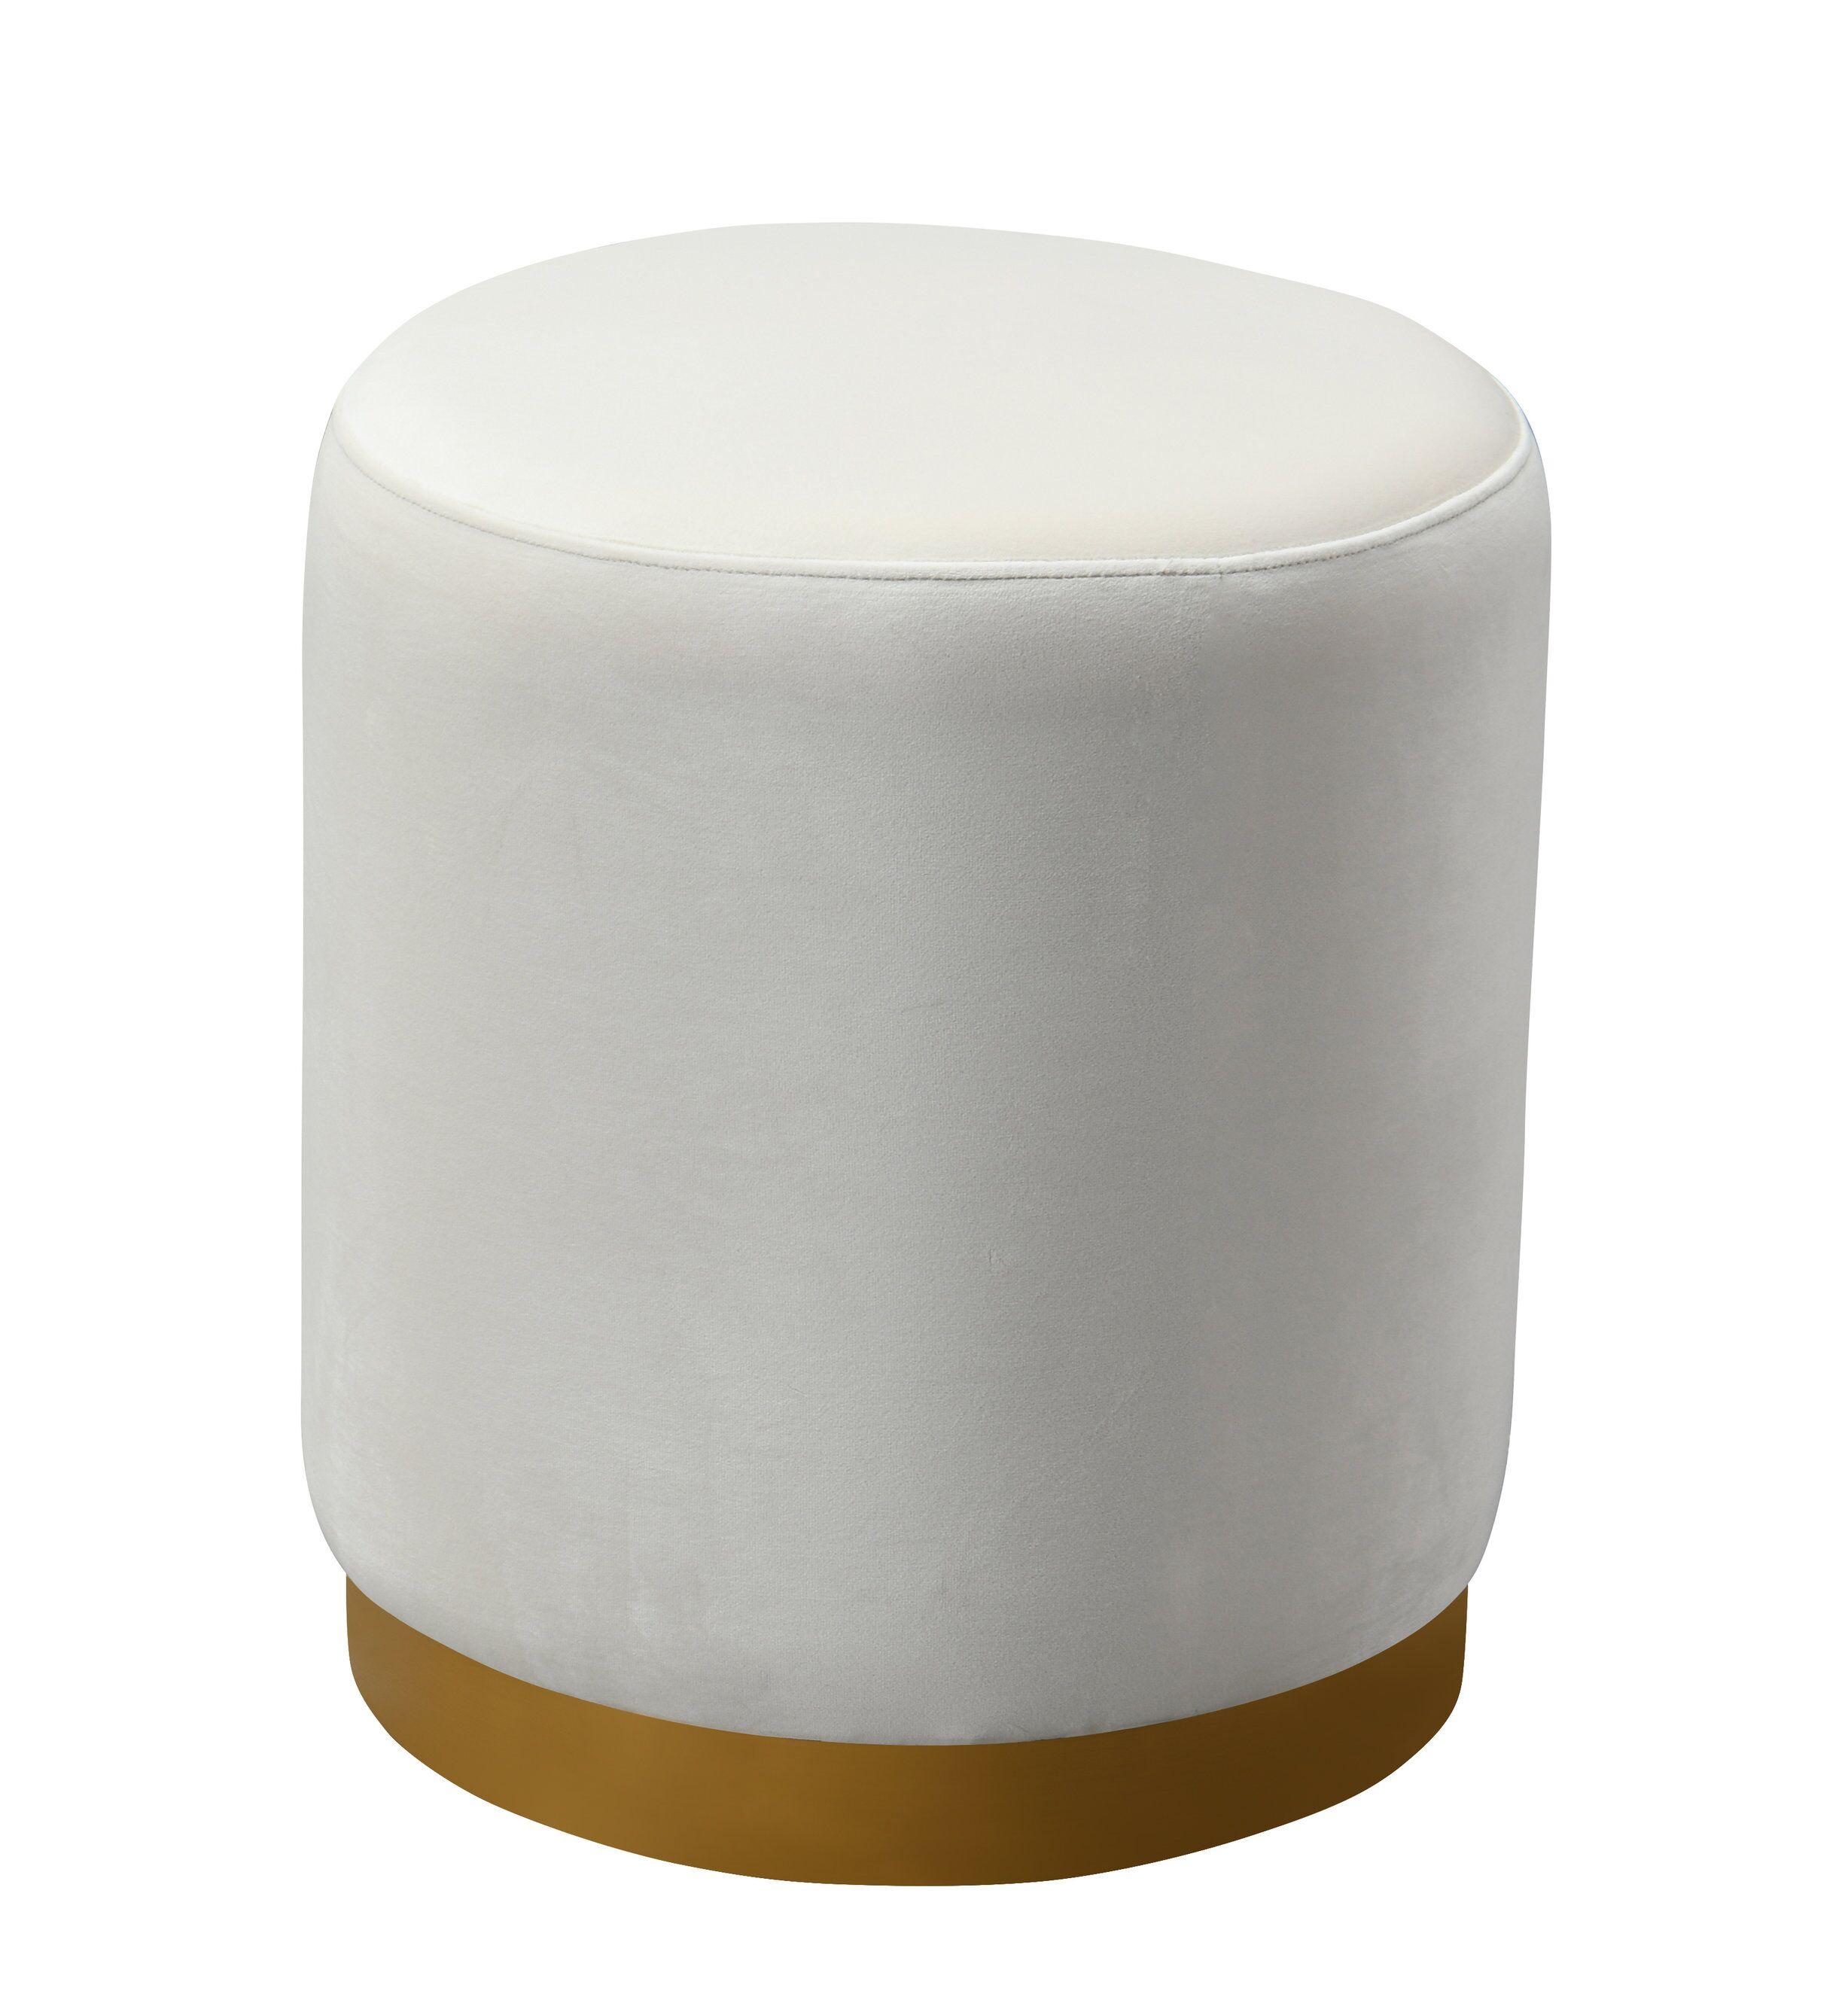 Pleasant Opal Cream Velvet Ottoman W Gold Base By Tov Furniture Cjindustries Chair Design For Home Cjindustriesco